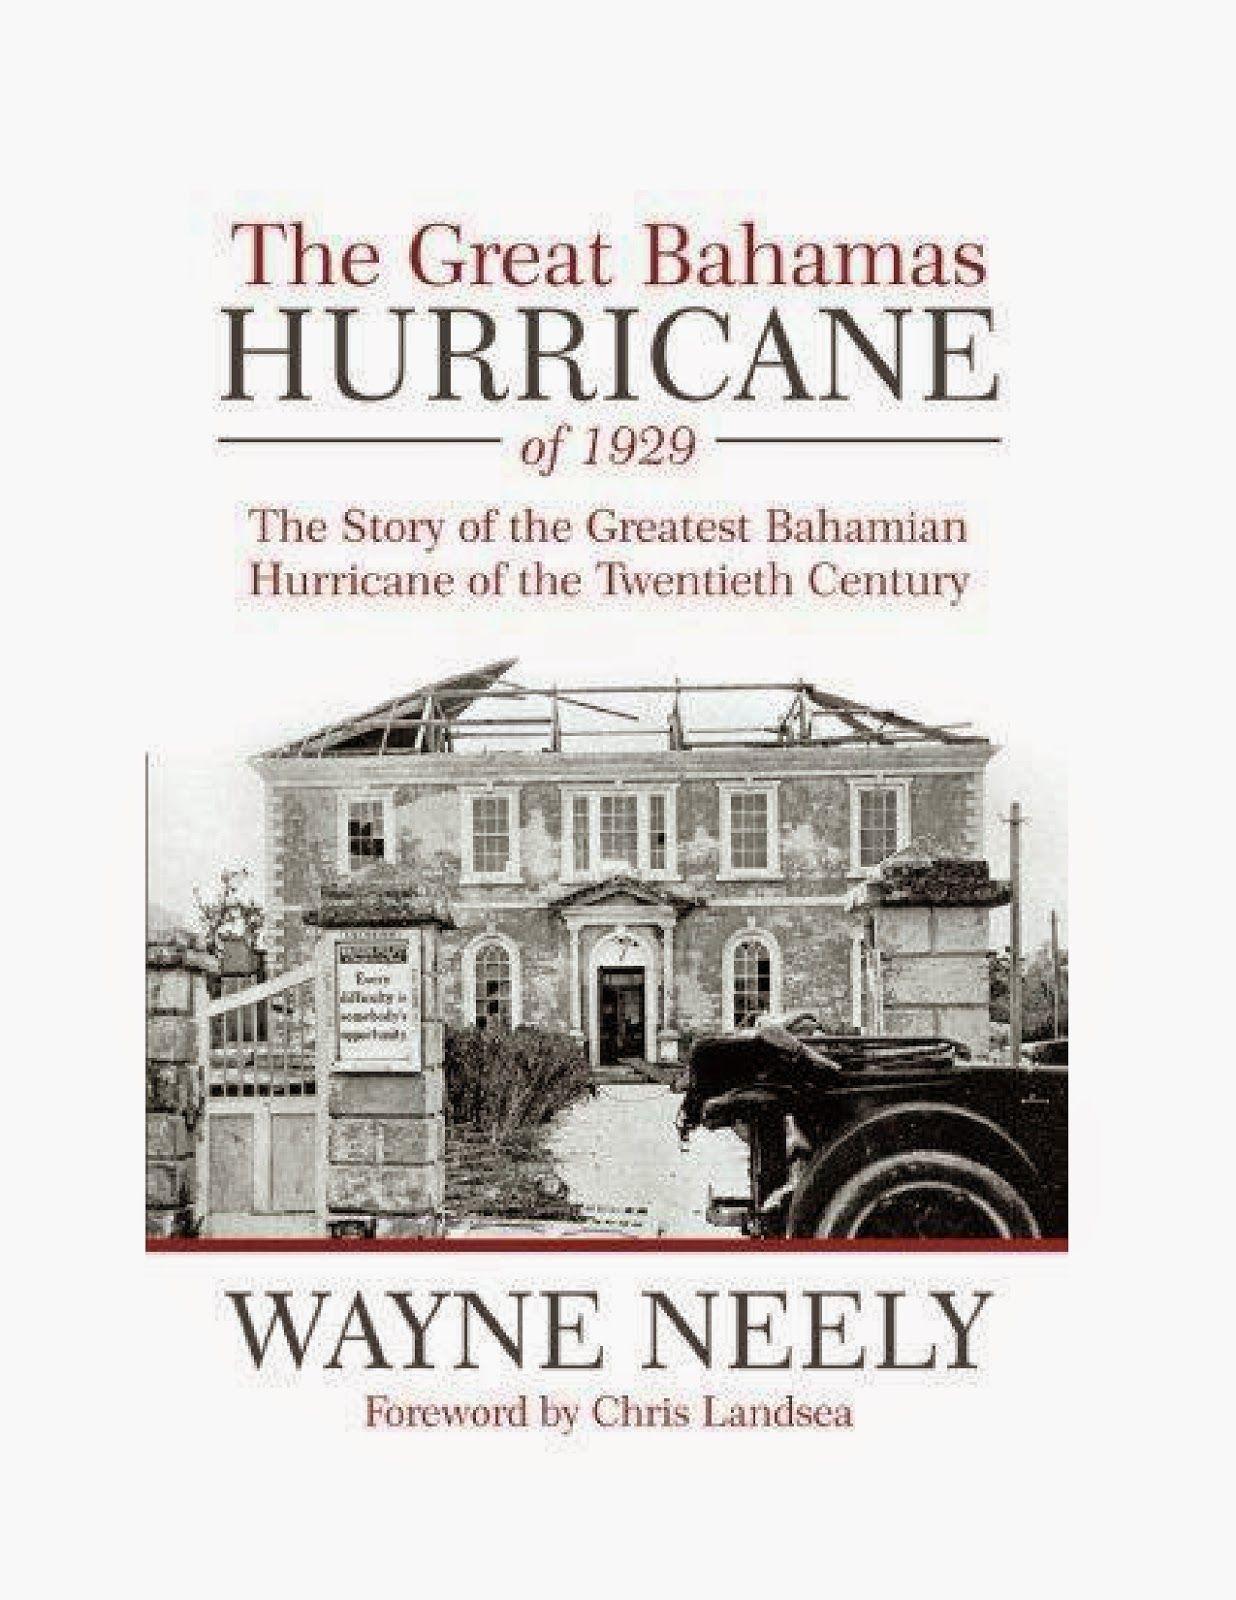 Httpamazongreat bahamas hurricane 1929 twentieth ebook explore bahamas hurricane new books and more fandeluxe Gallery